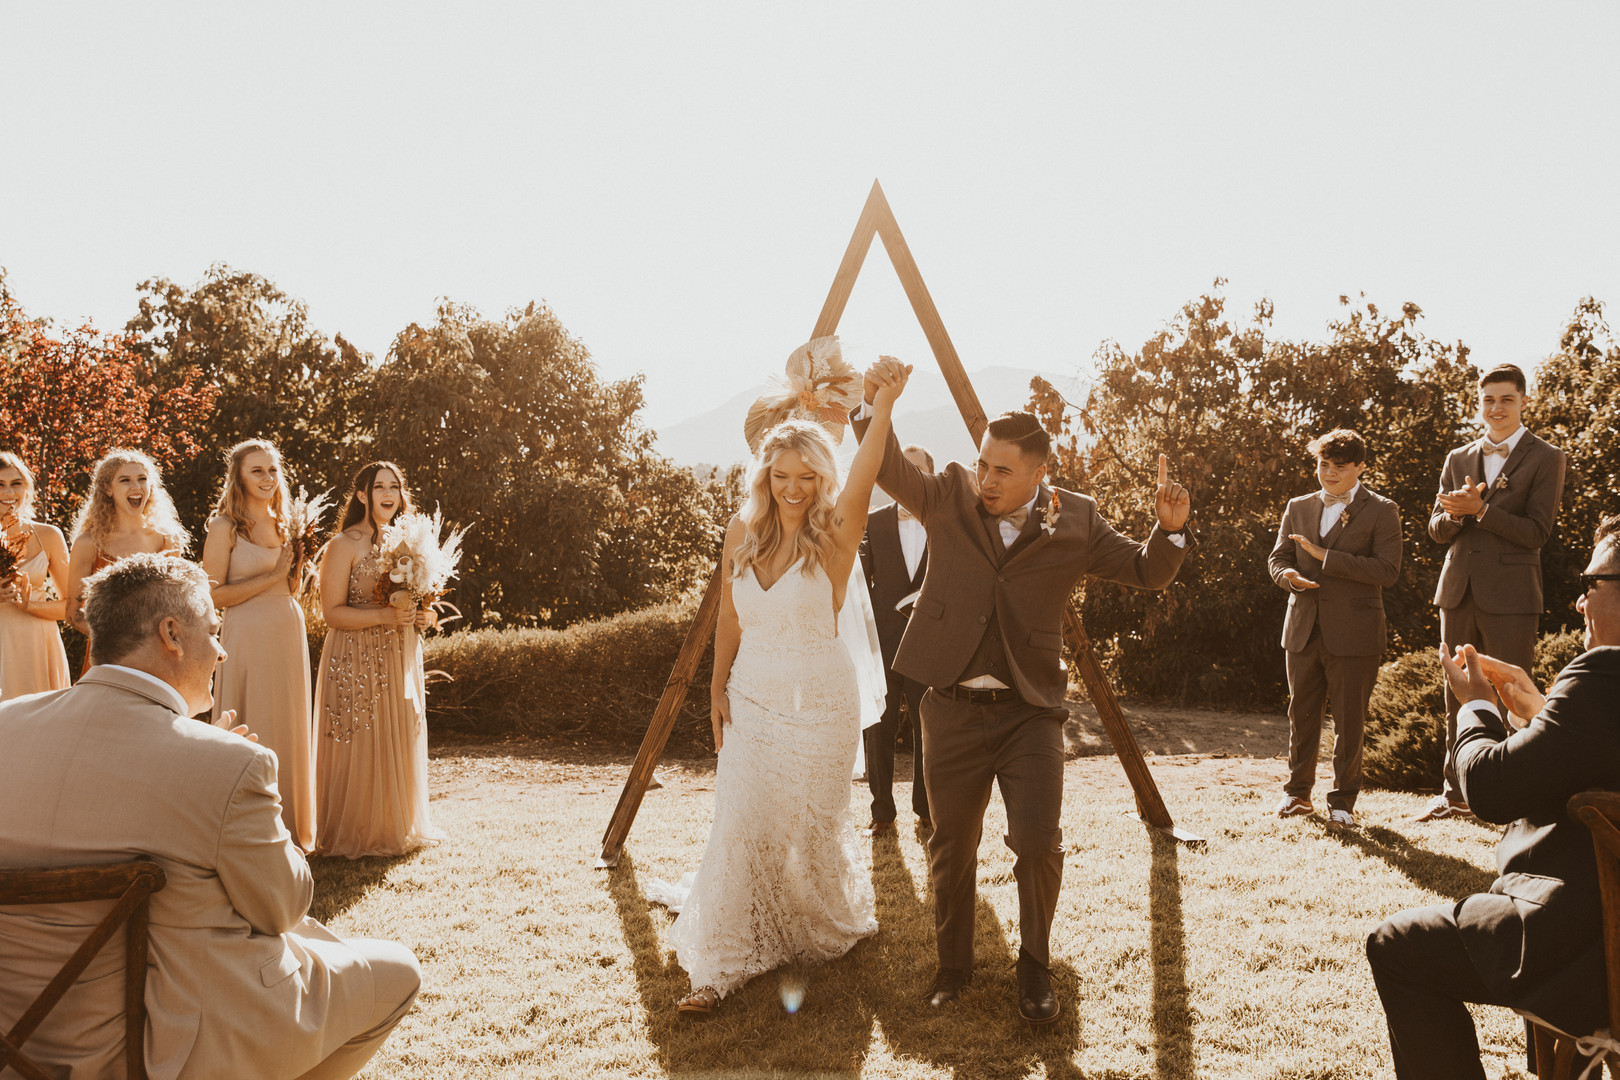 temecula wedding (35 of 59) - Copy - Cop